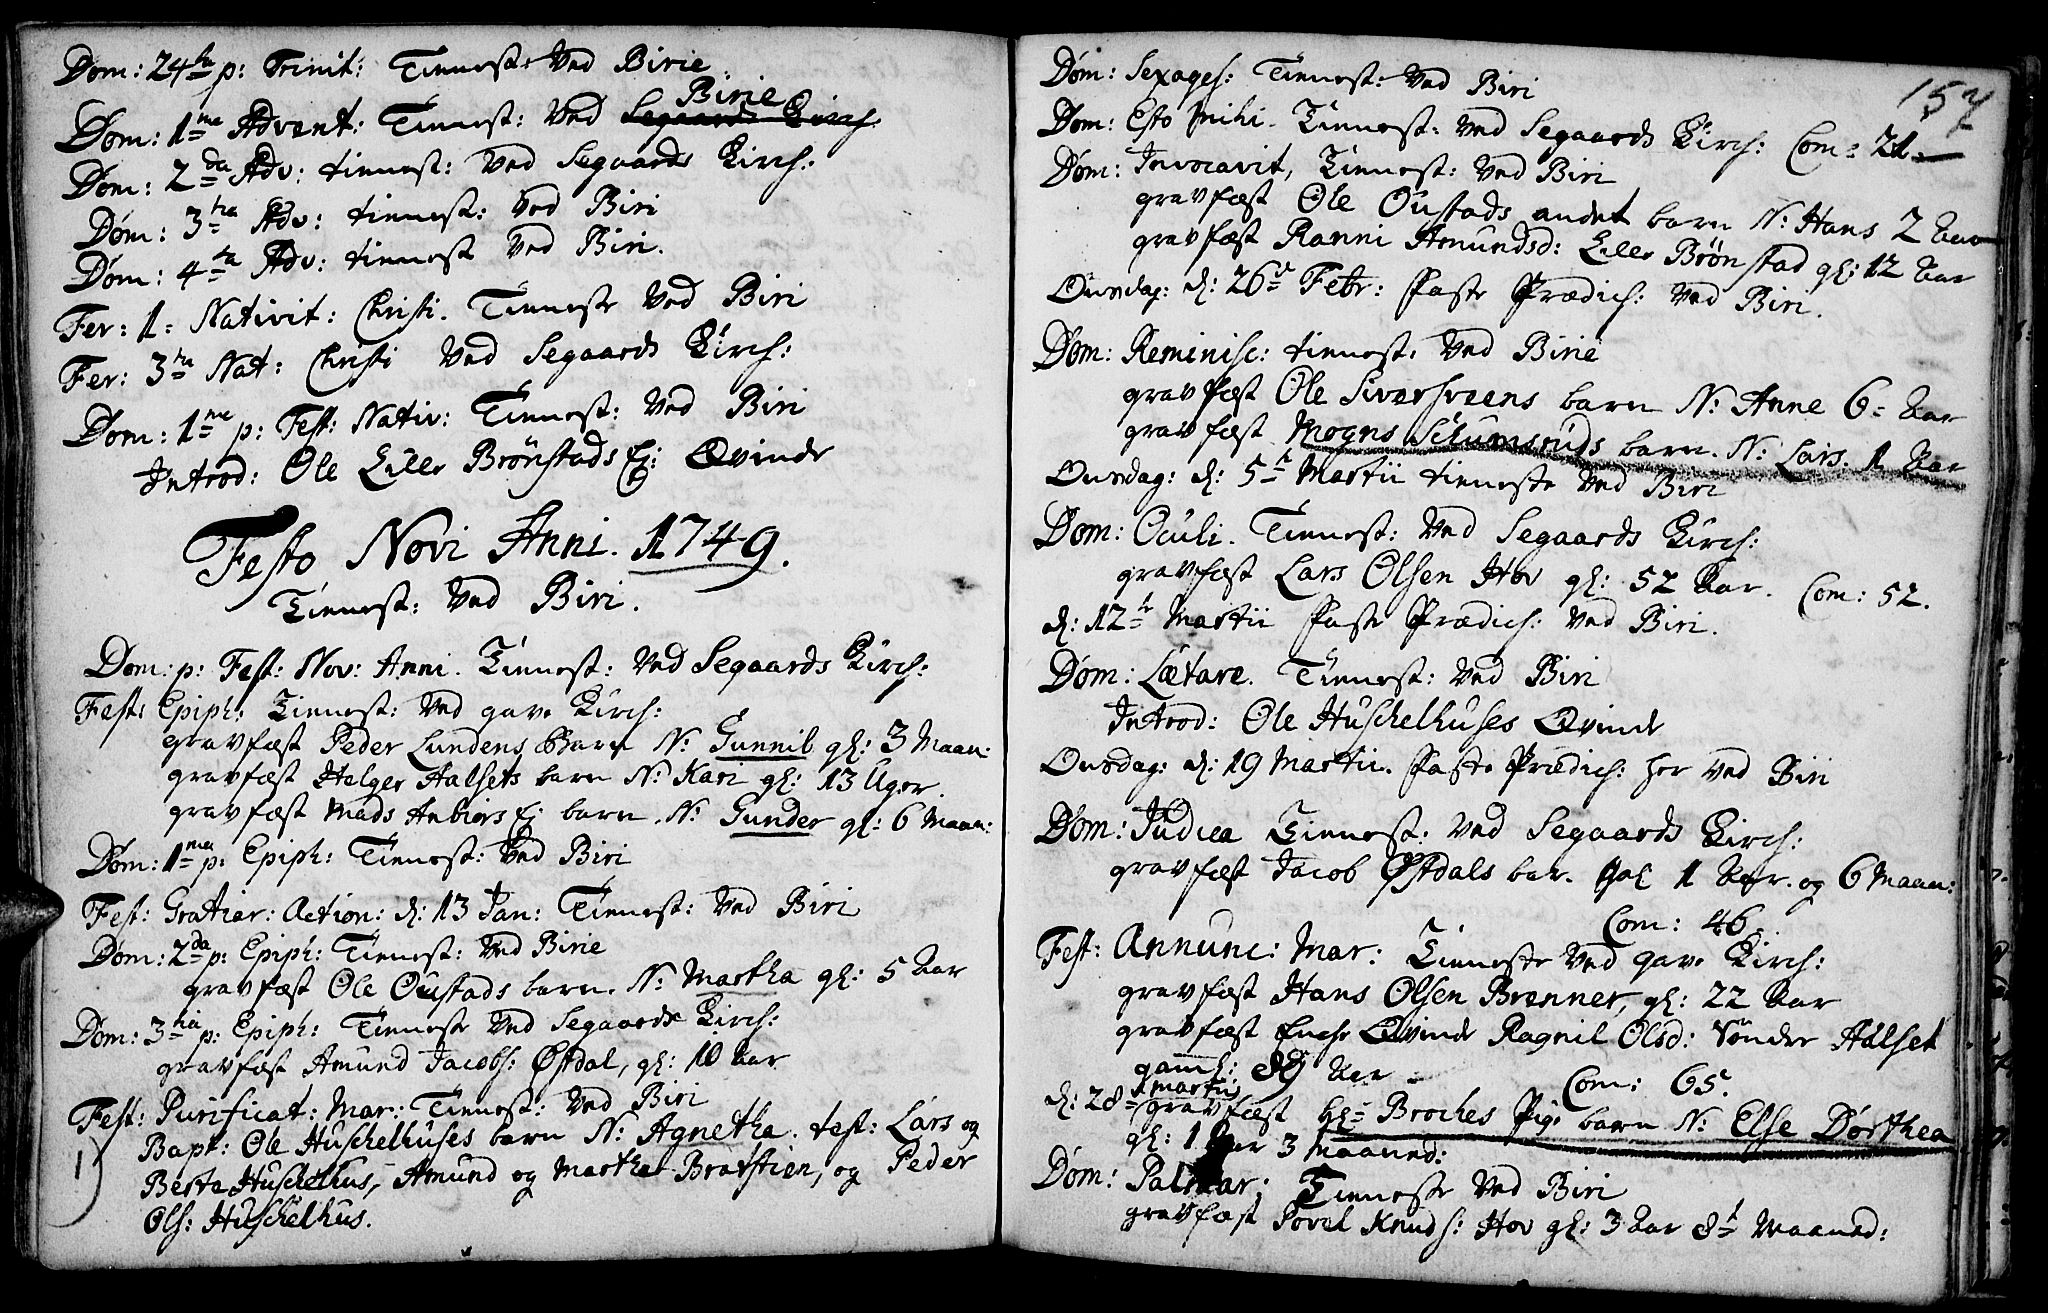 SAH, Biri prestekontor, Ministerialbok nr. 1, 1730-1754, s. 157